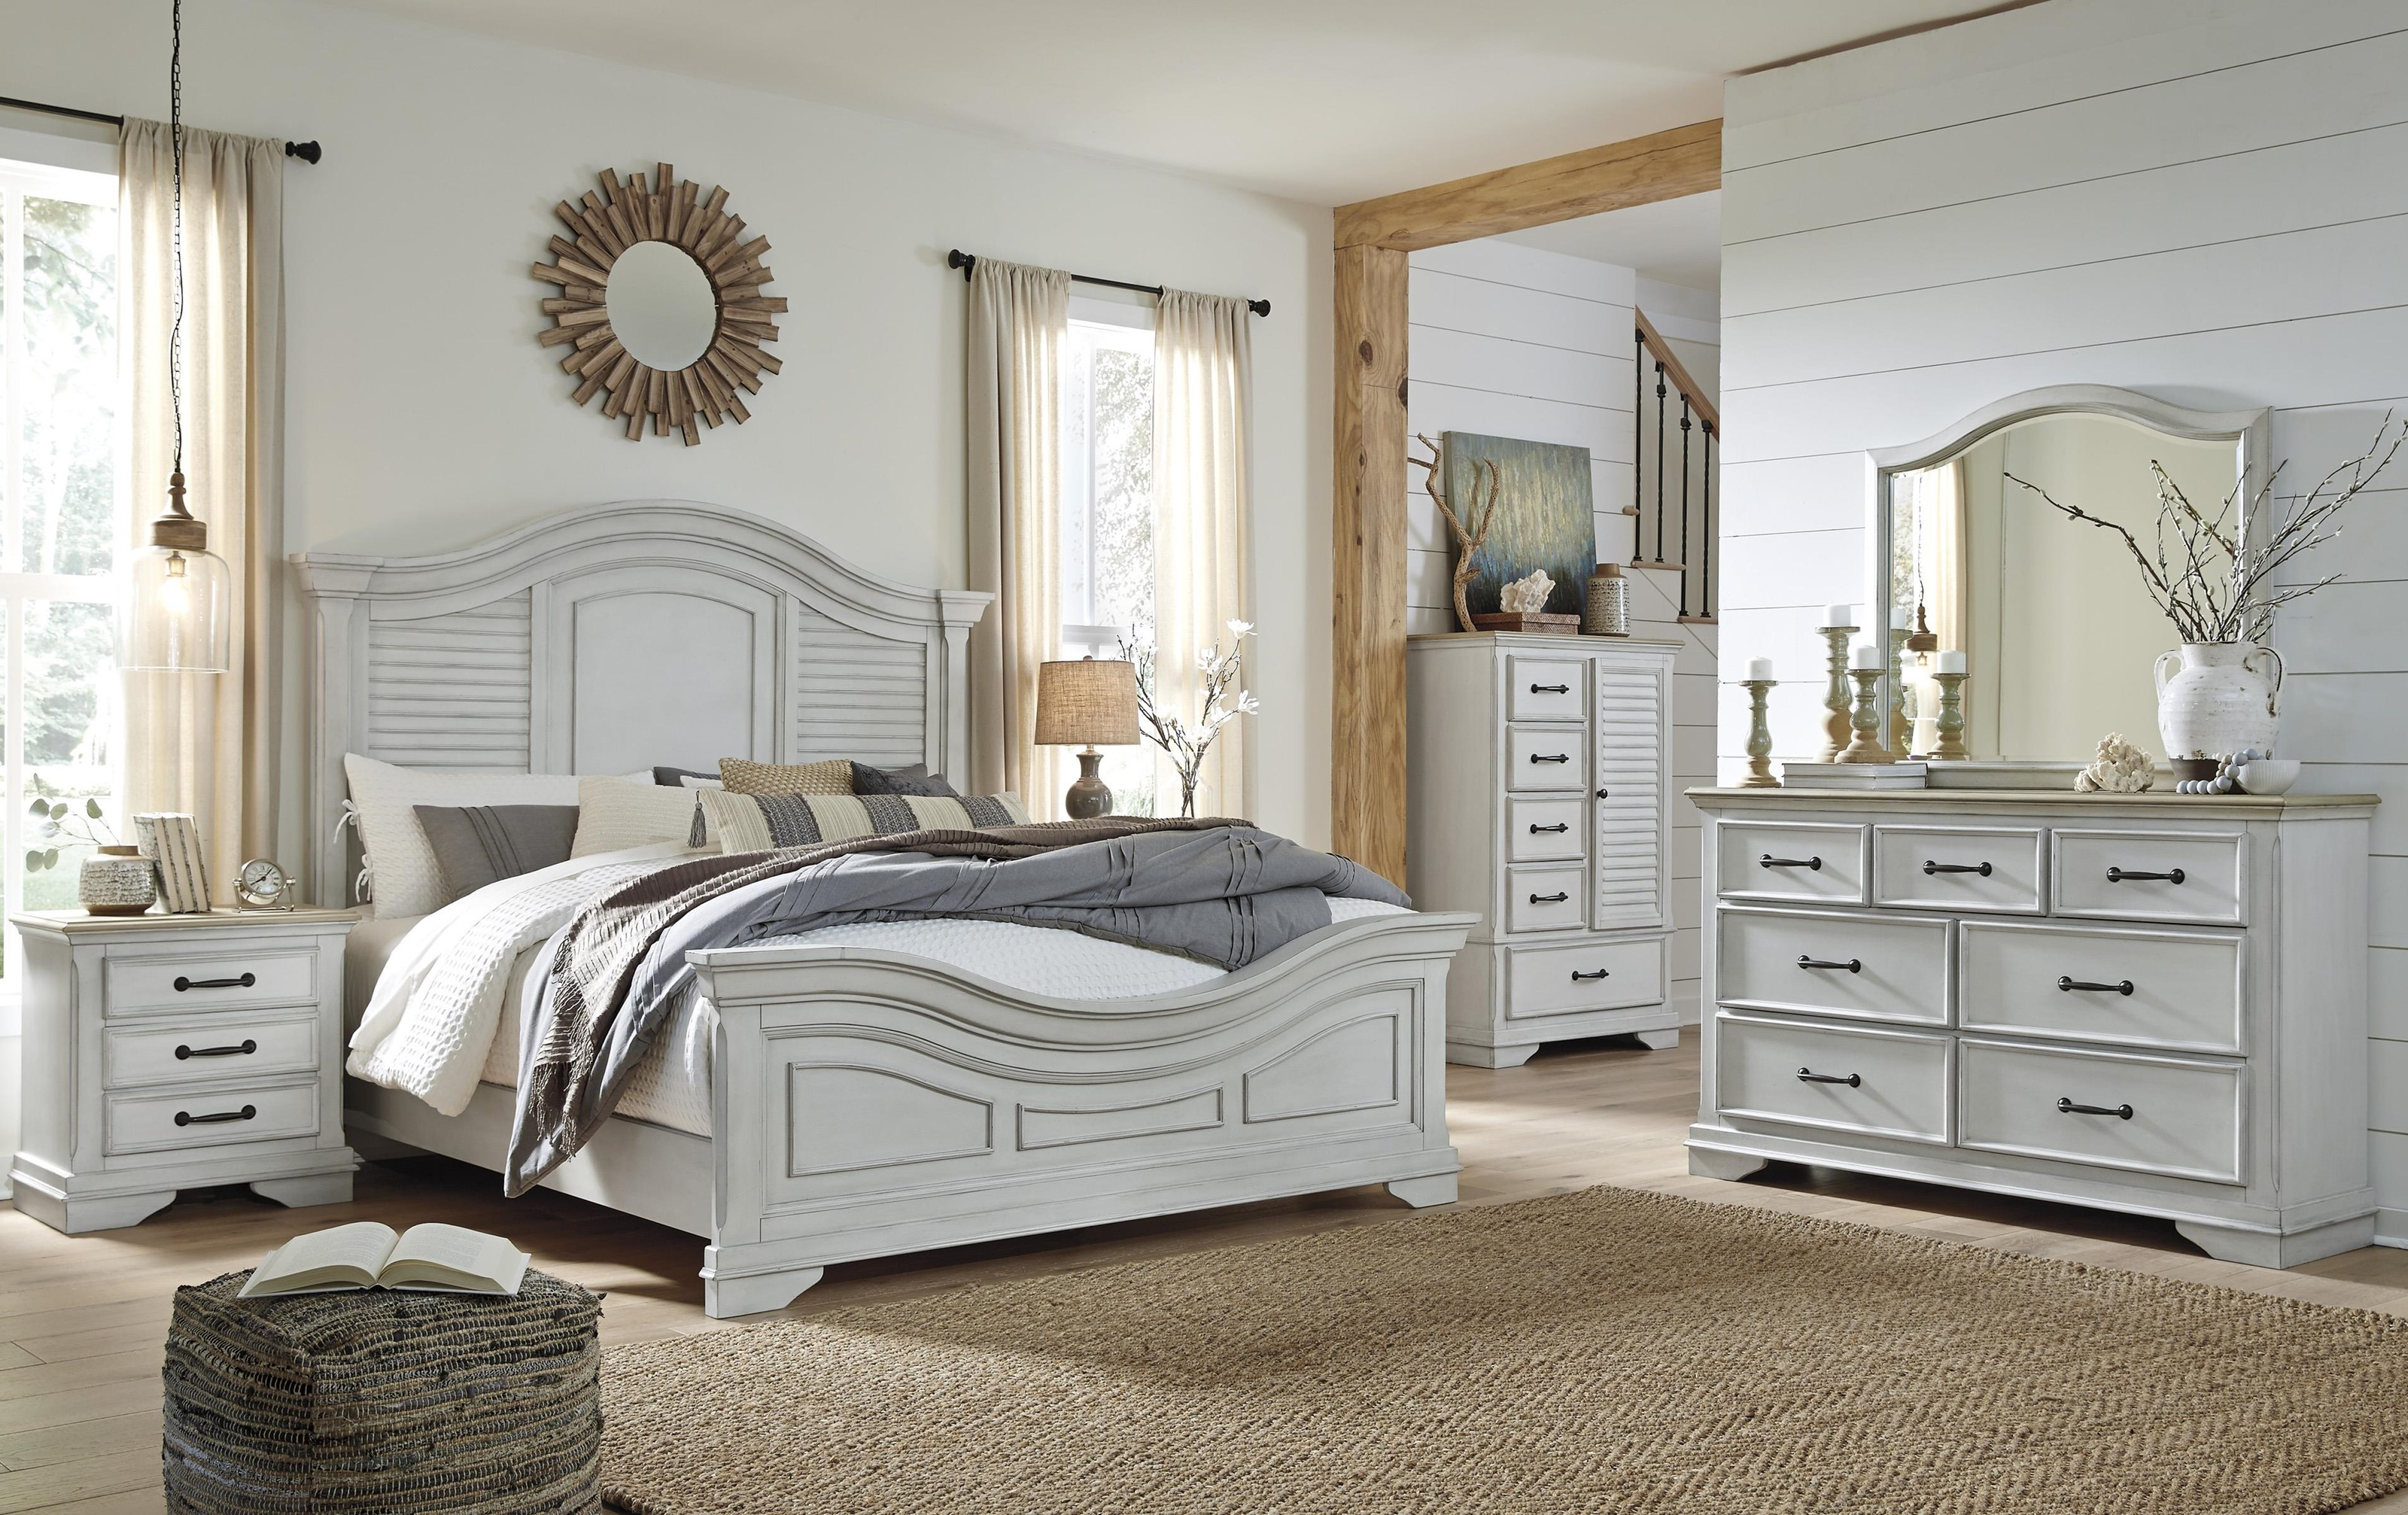 Teganville 6 Piece Queen Panel Bedroom Set by Millennium at Sam Levitz Furniture